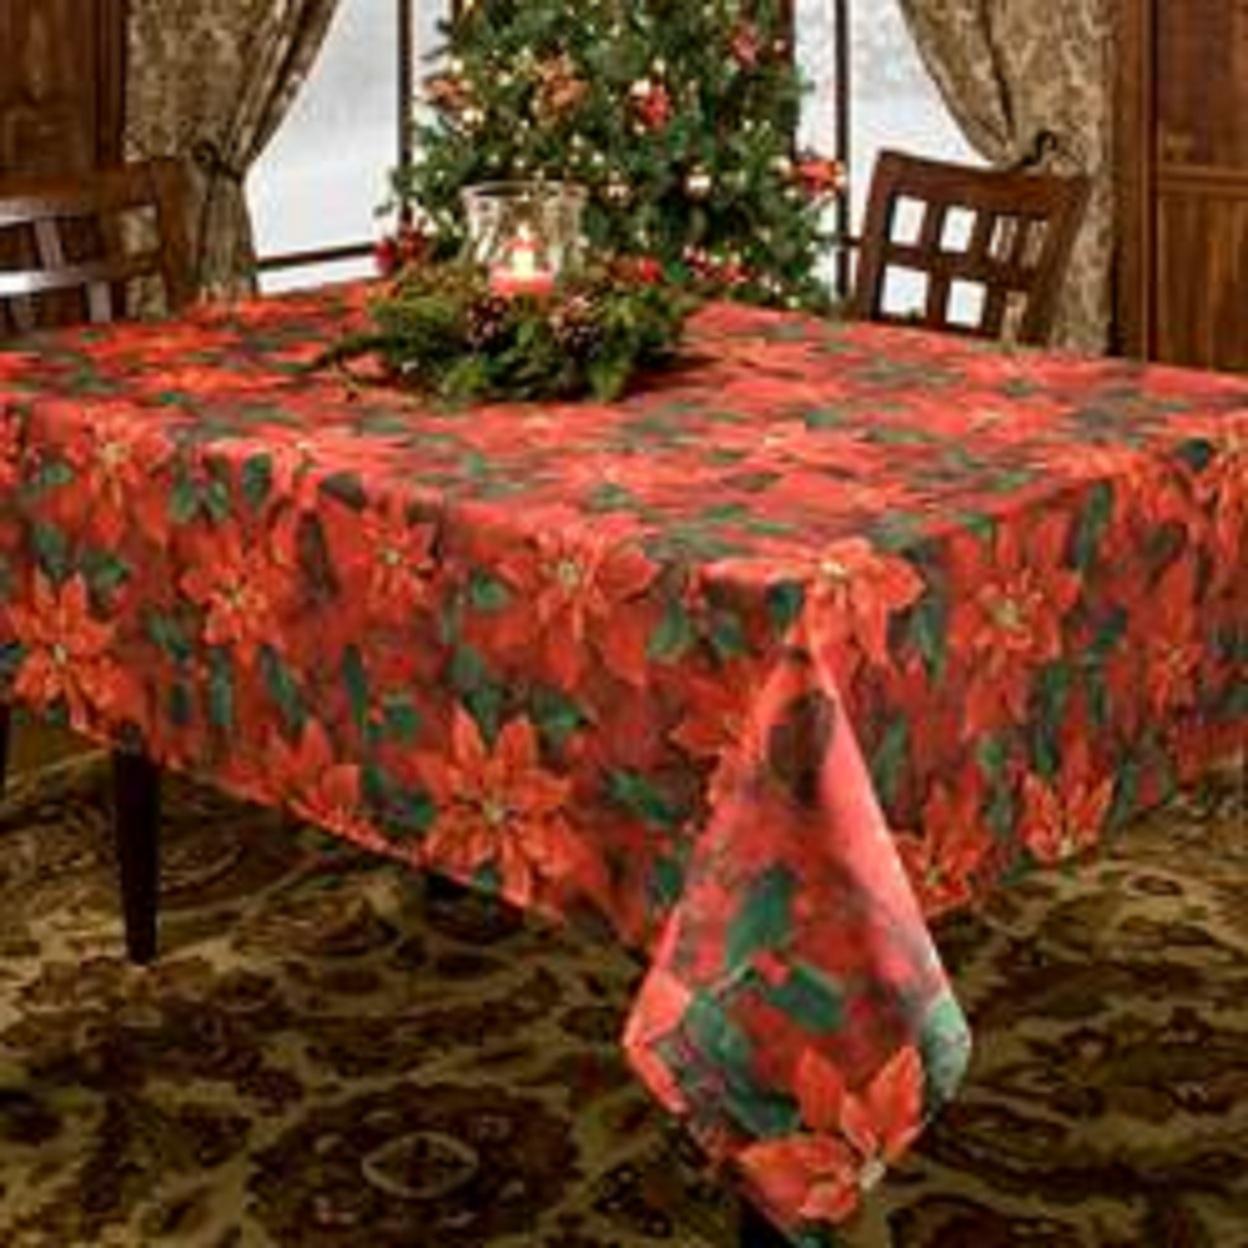 "POINSETTIAS ELEGANCE CHRISTMAS HOLIDAYS TABLECLOTH (sz 60""x 84"" - $26.99"